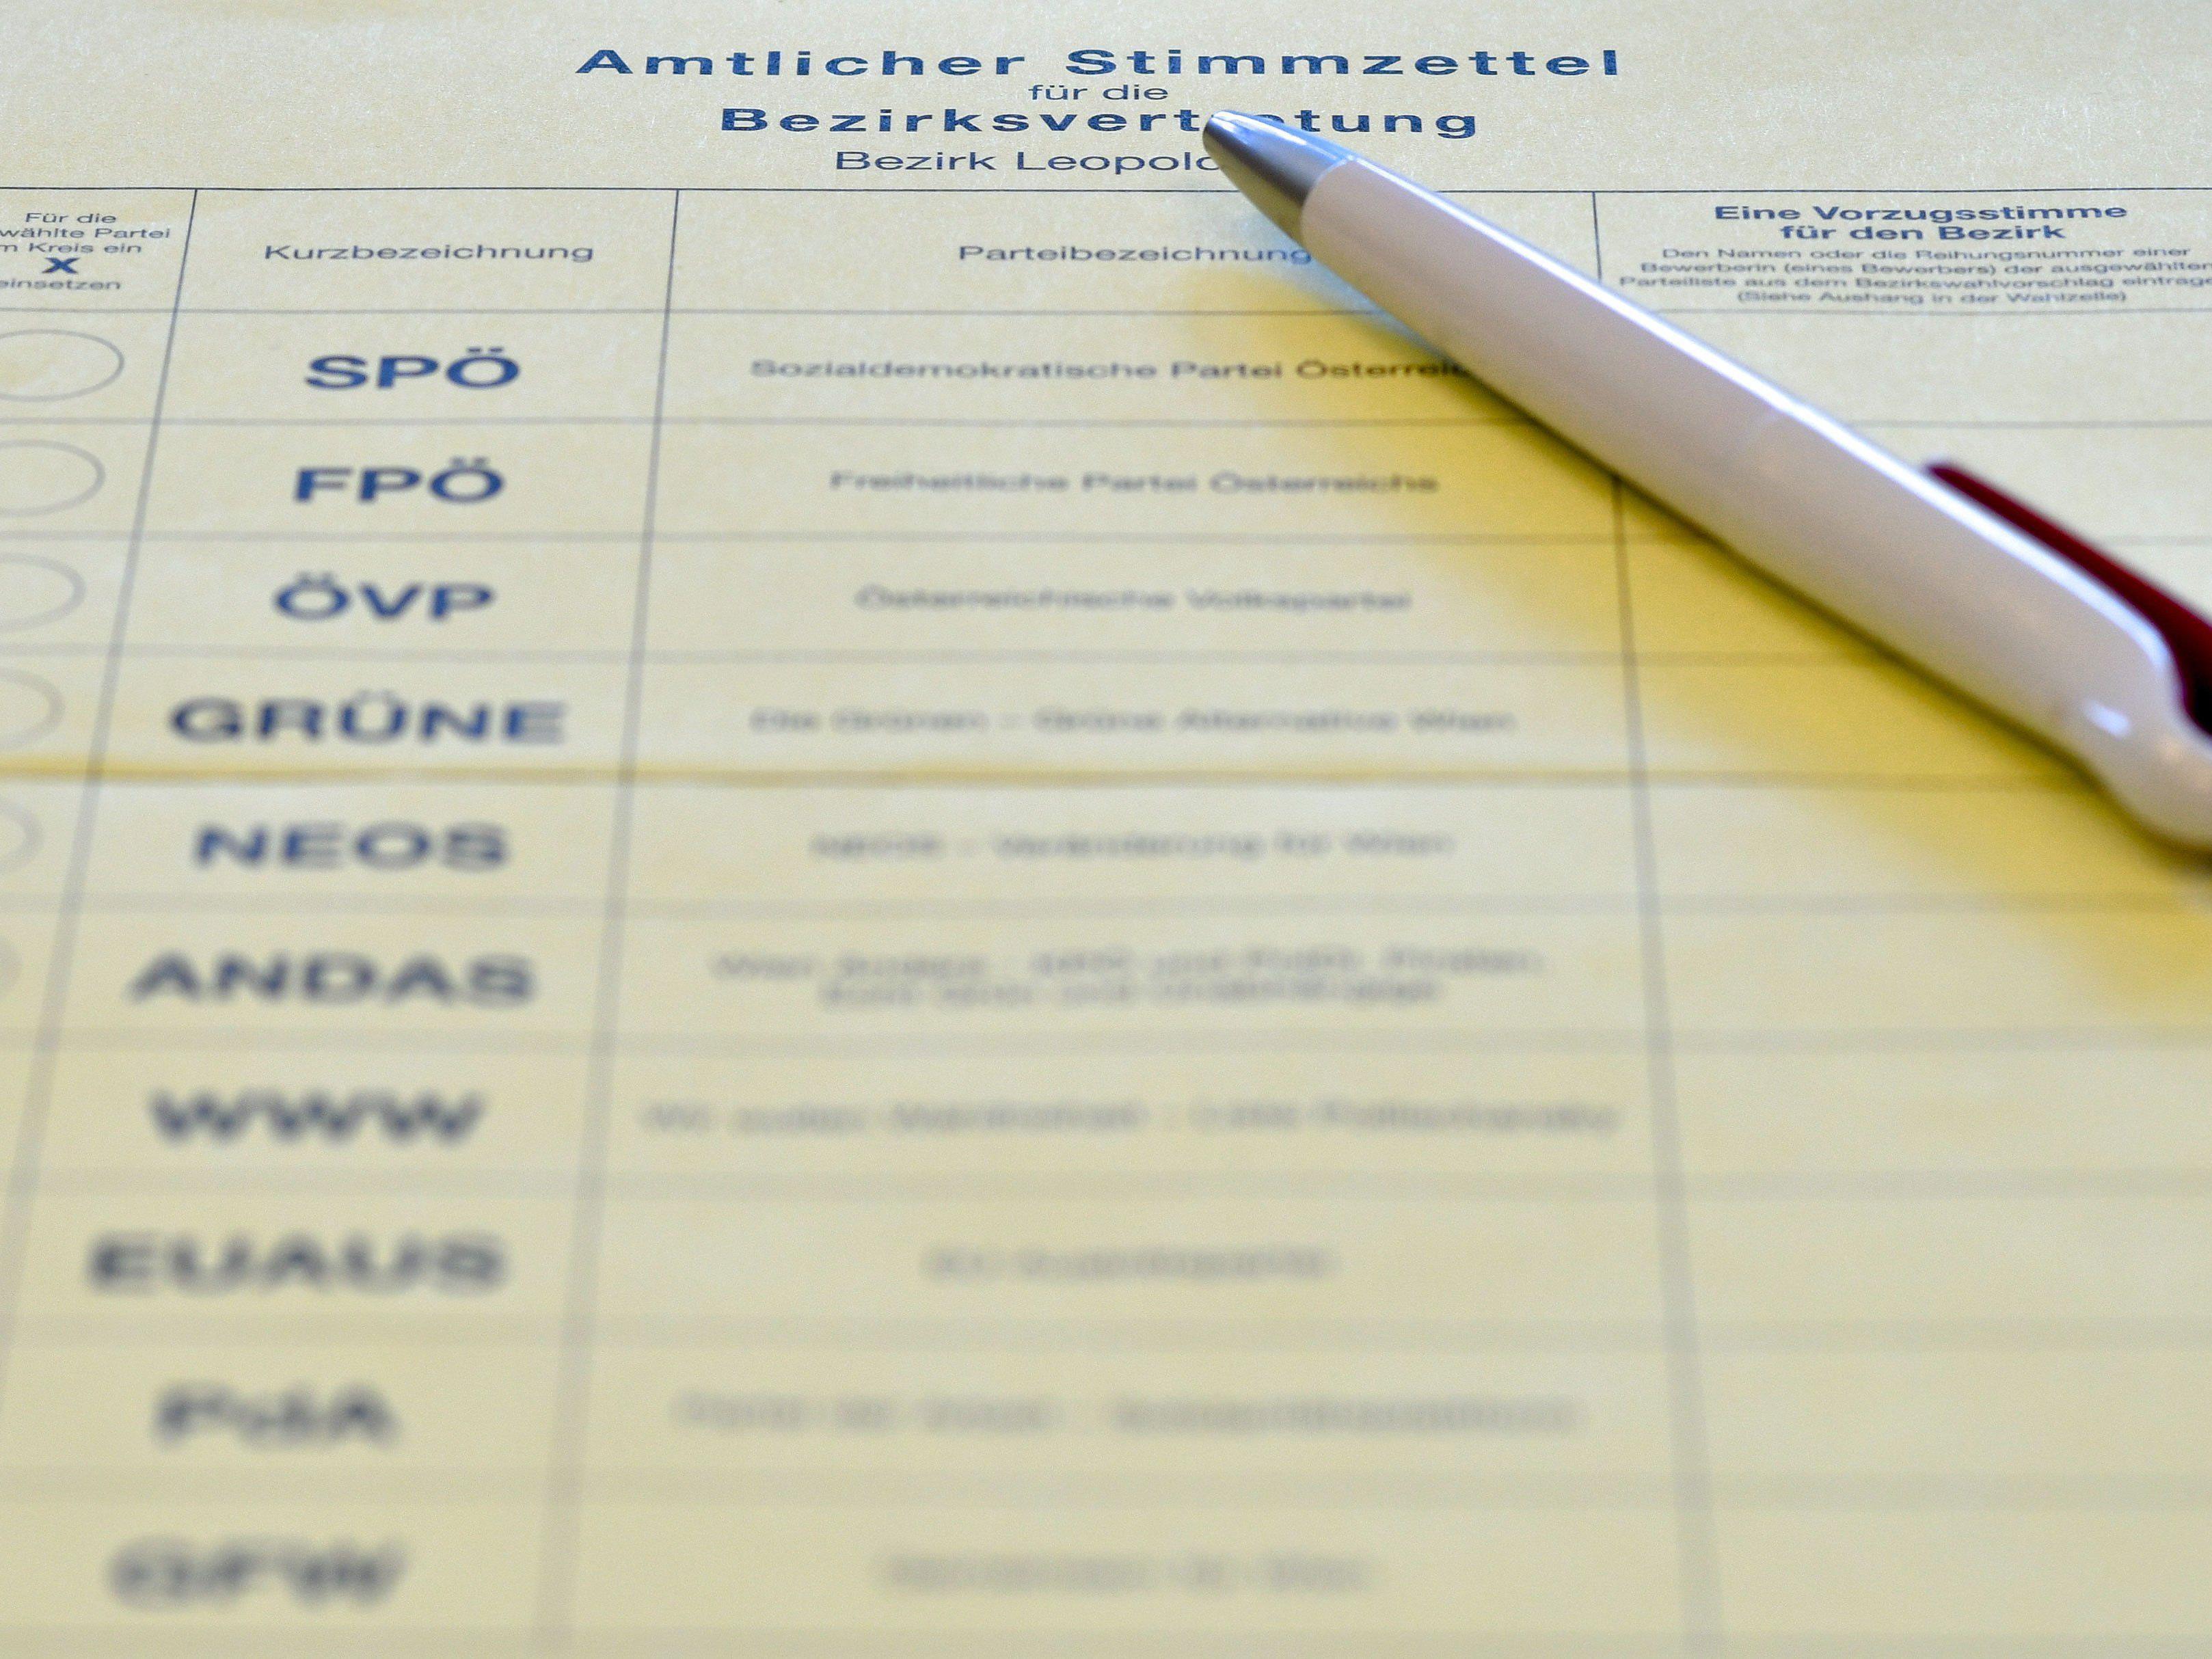 In Wien-Leopoldstadt wurde erneut gewählt